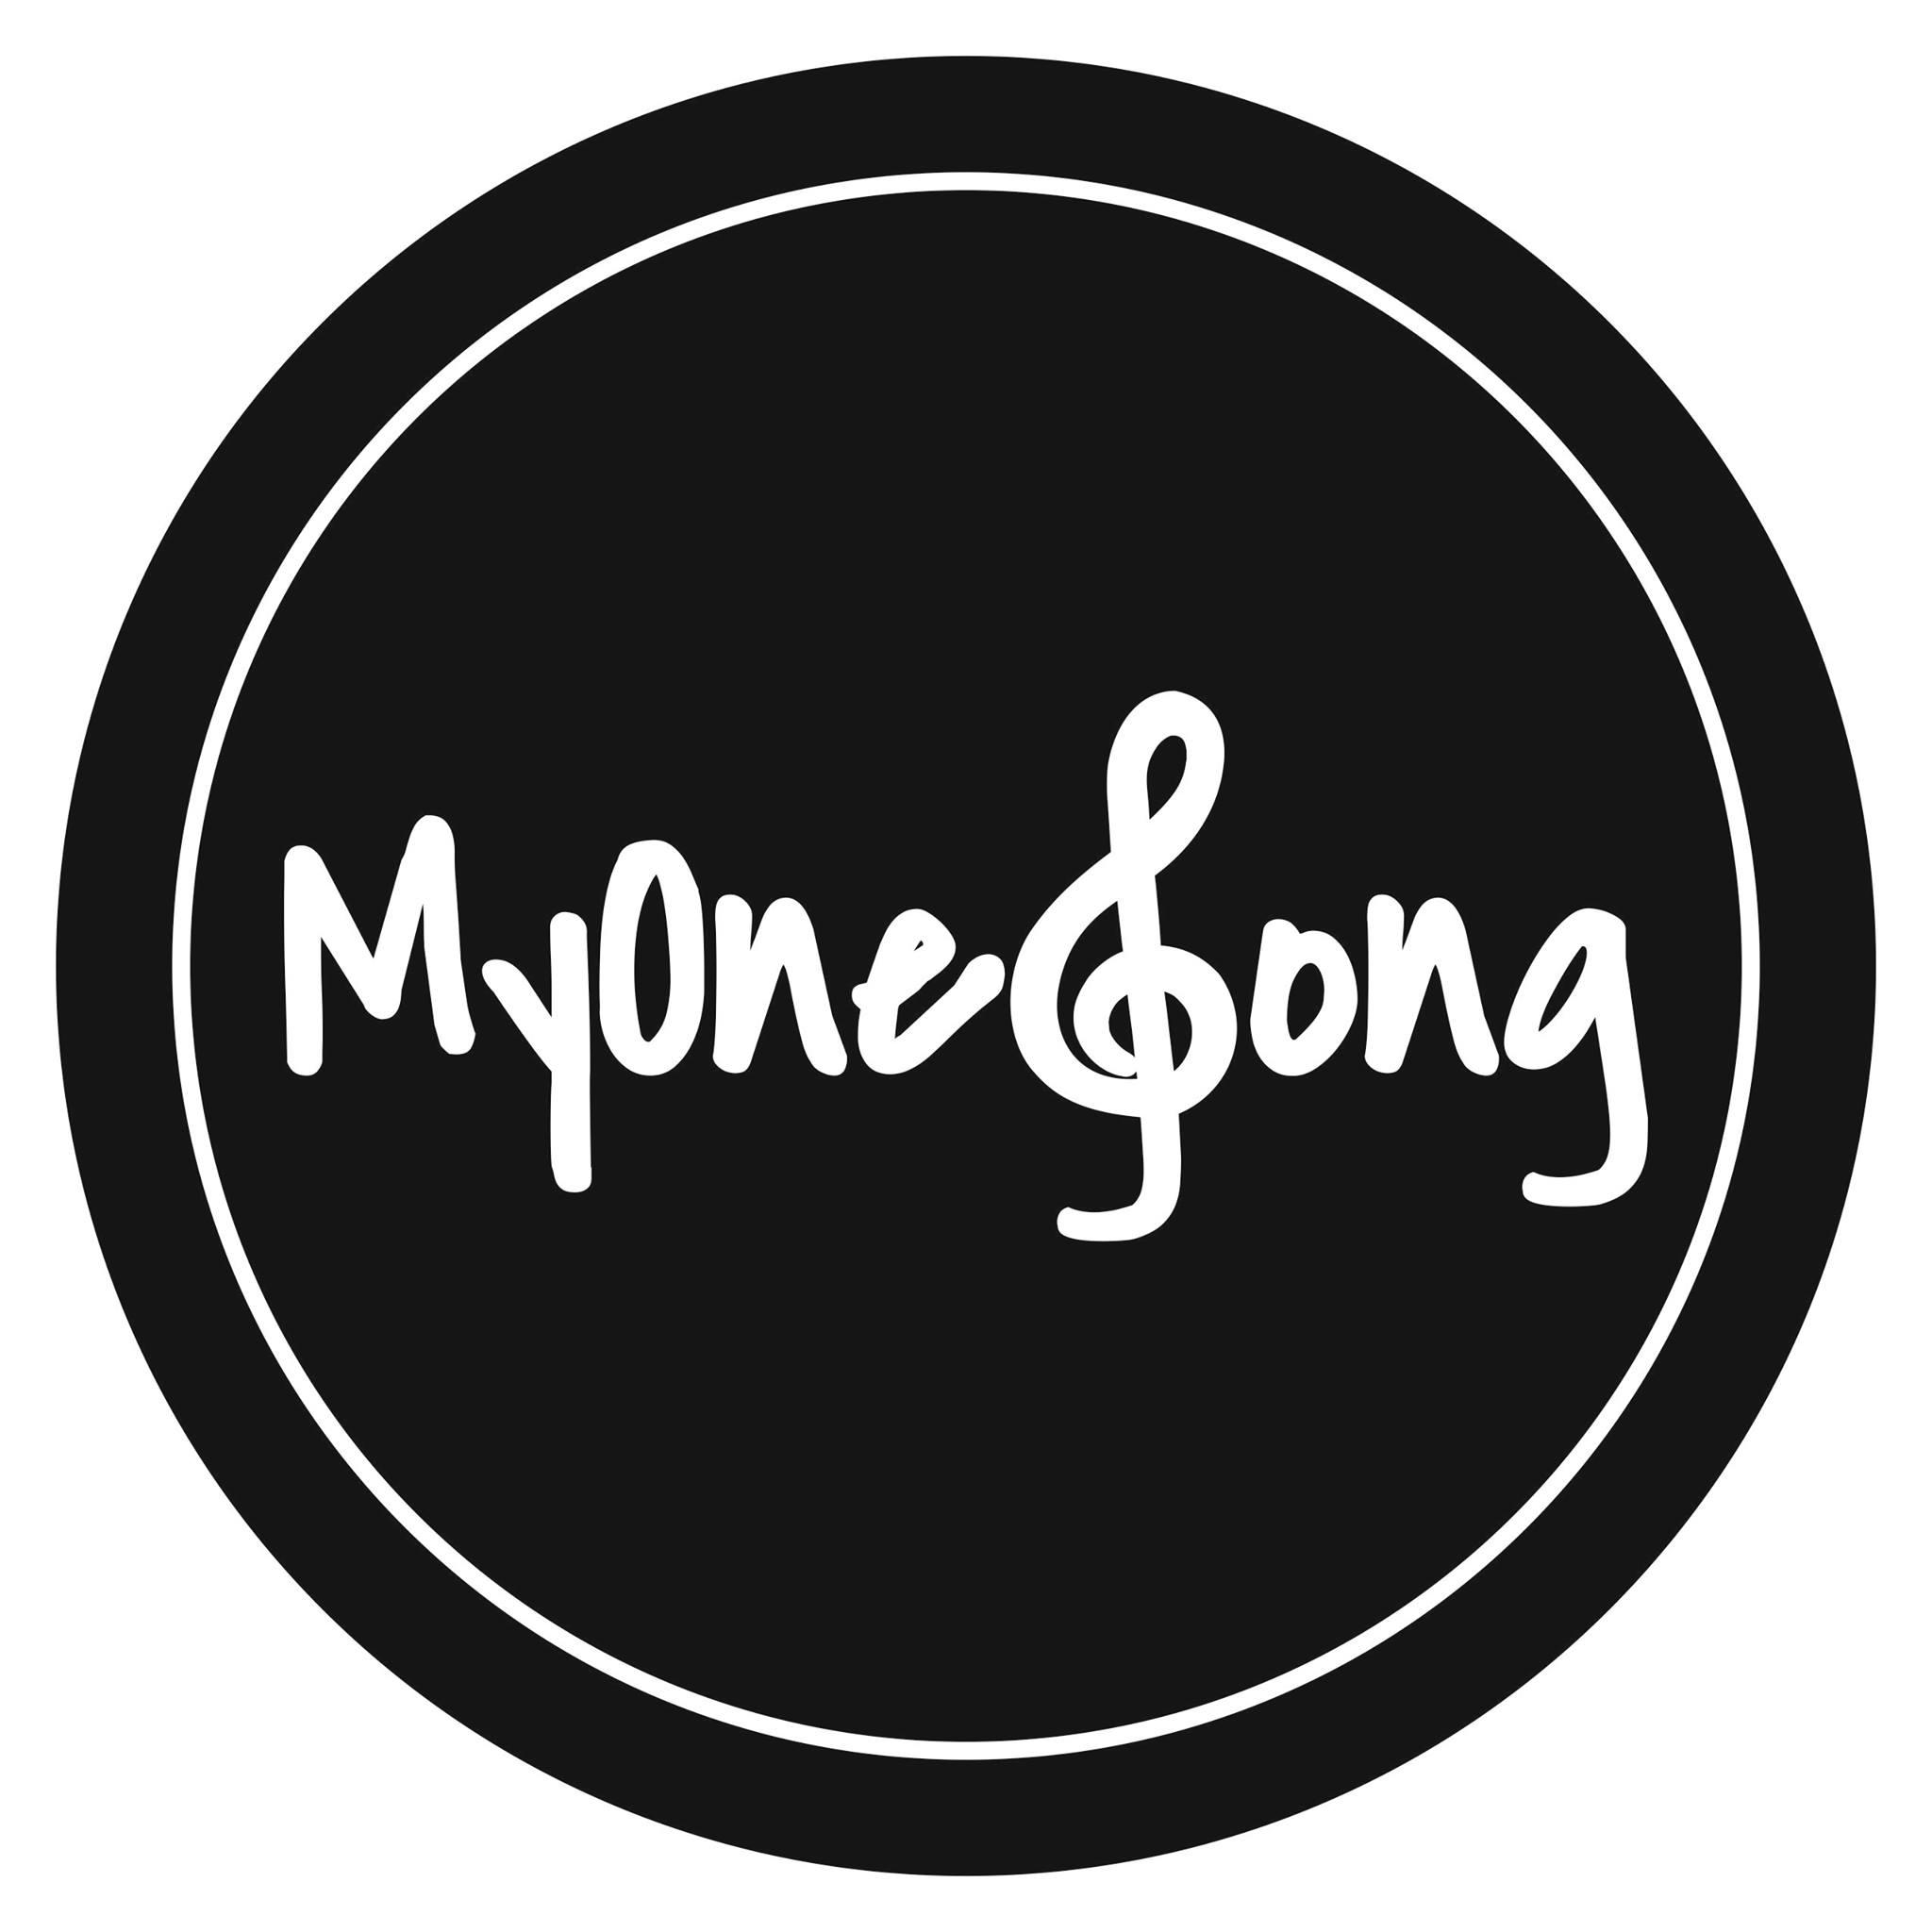 myonesong music song.jpg